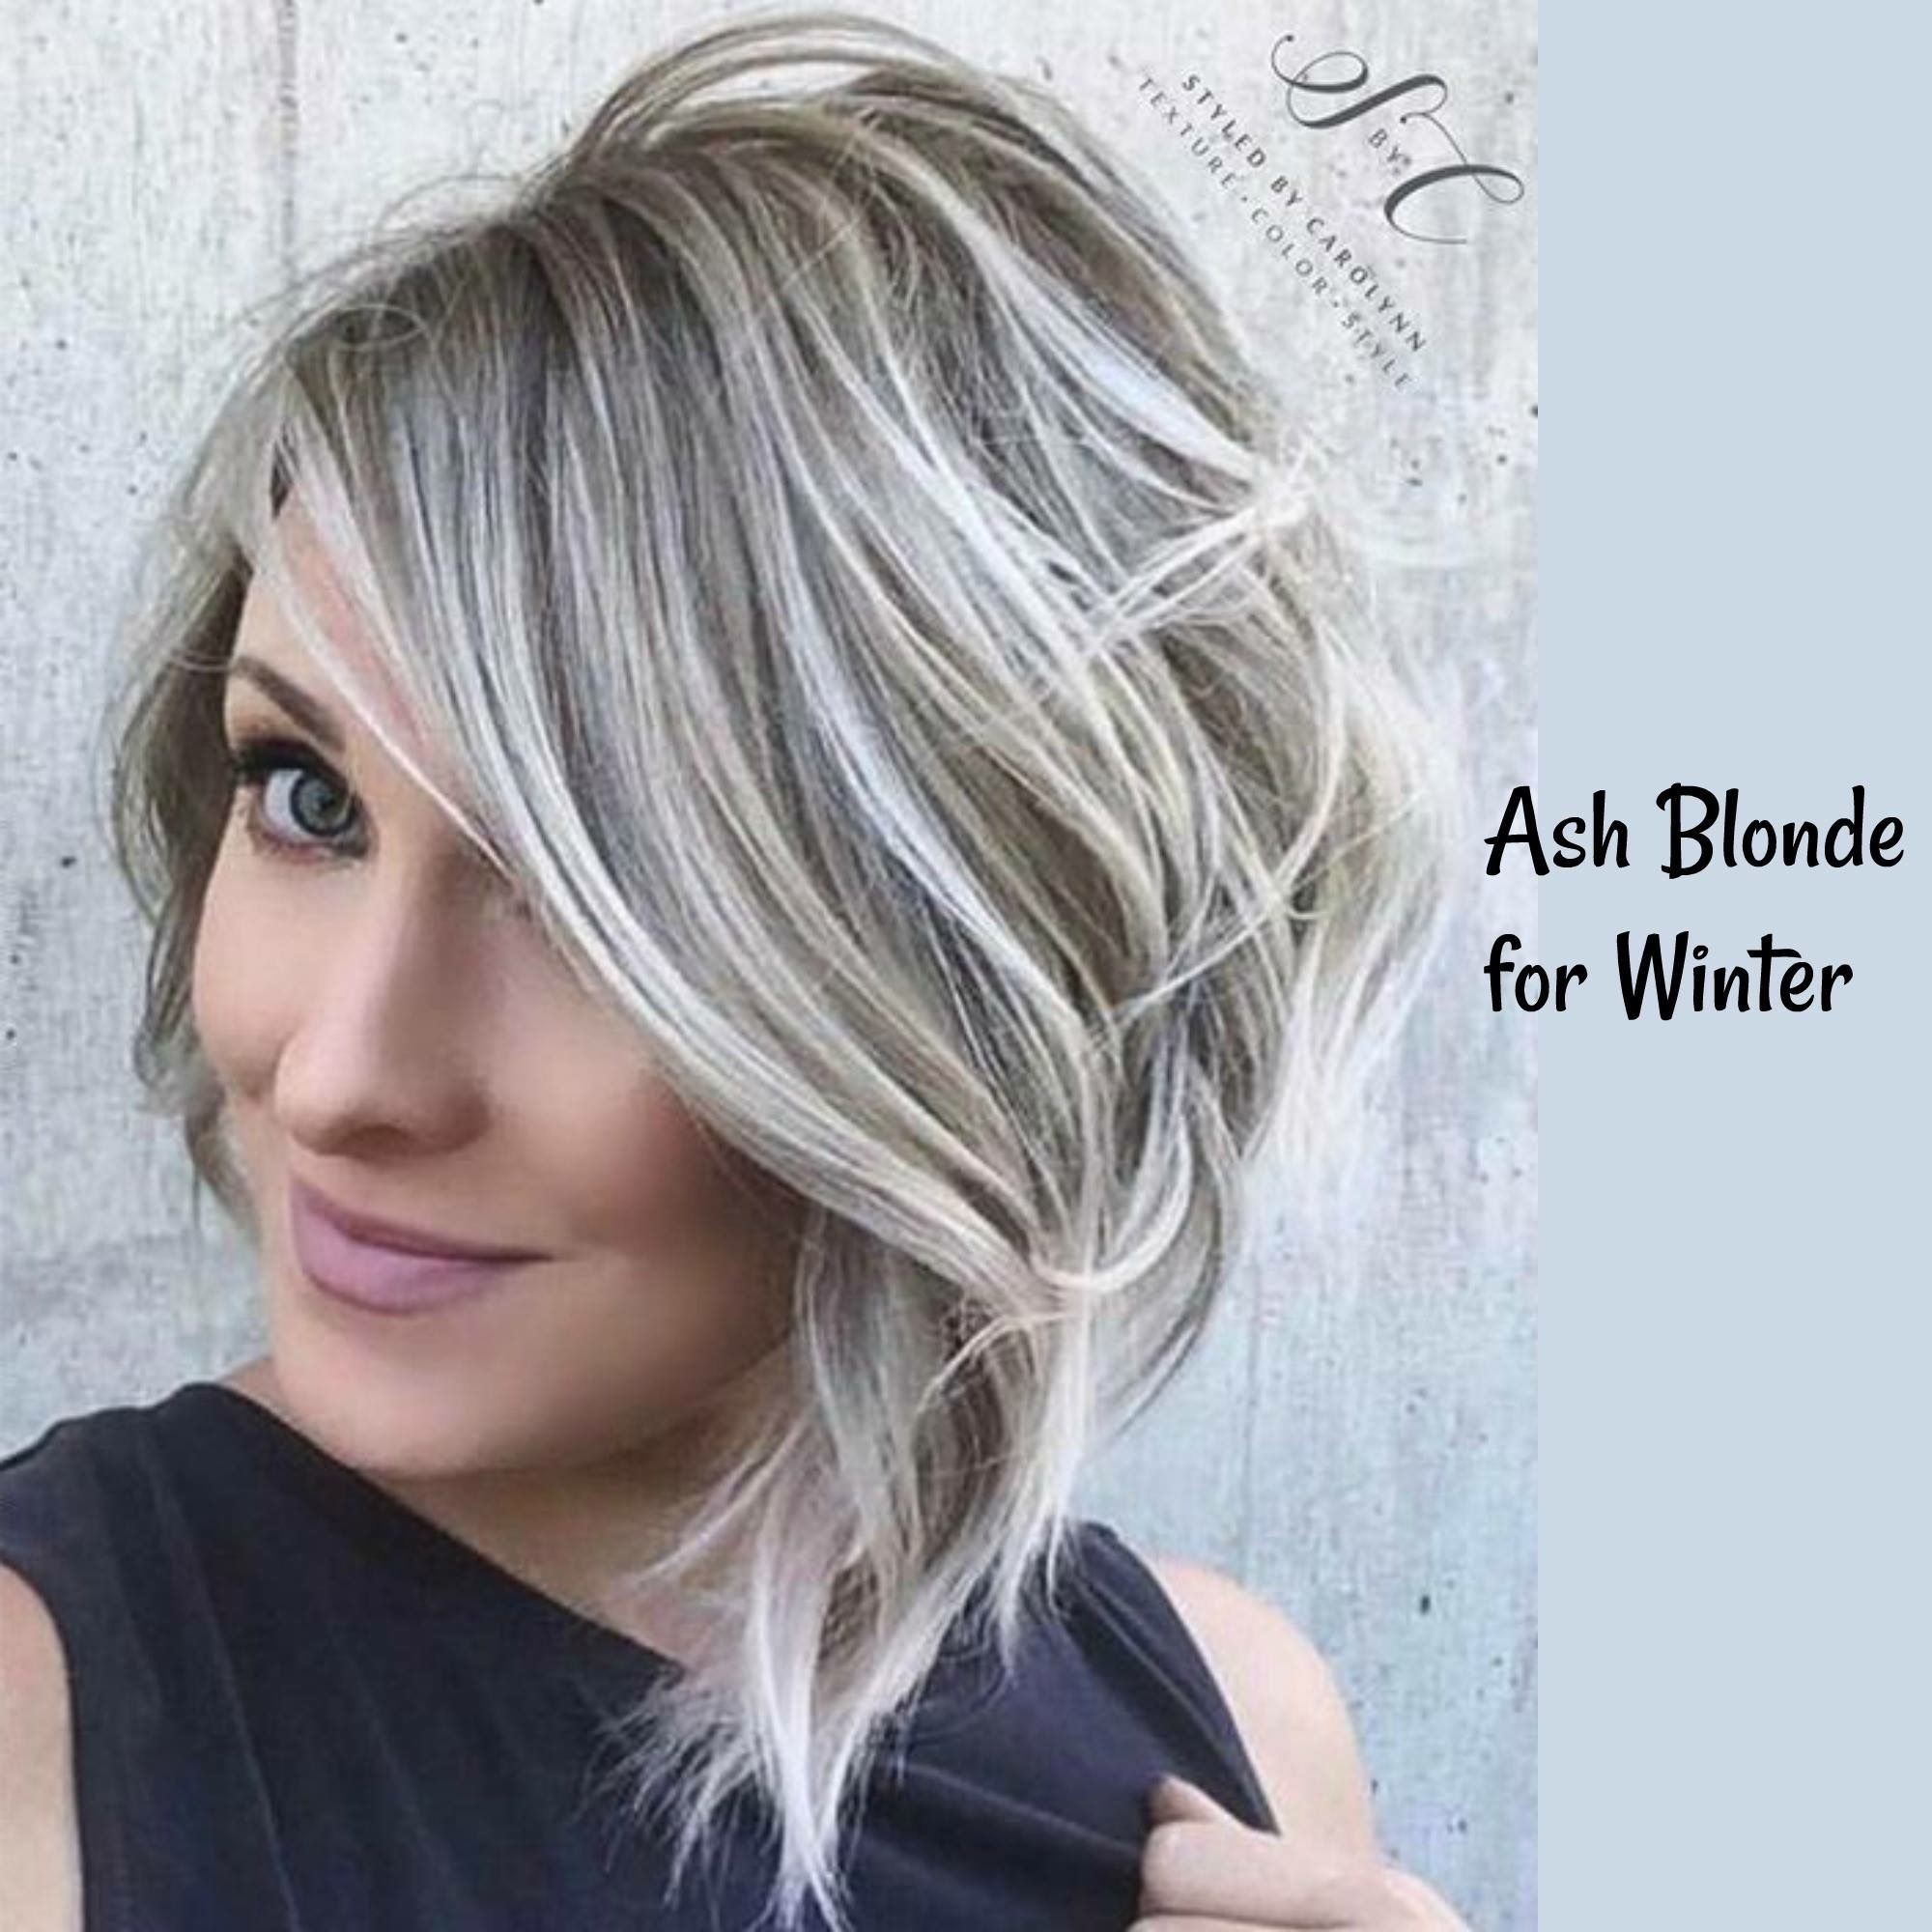 Short ash blonde hair for winter tamielisabeth fσℓℓσω тσ ѕєє